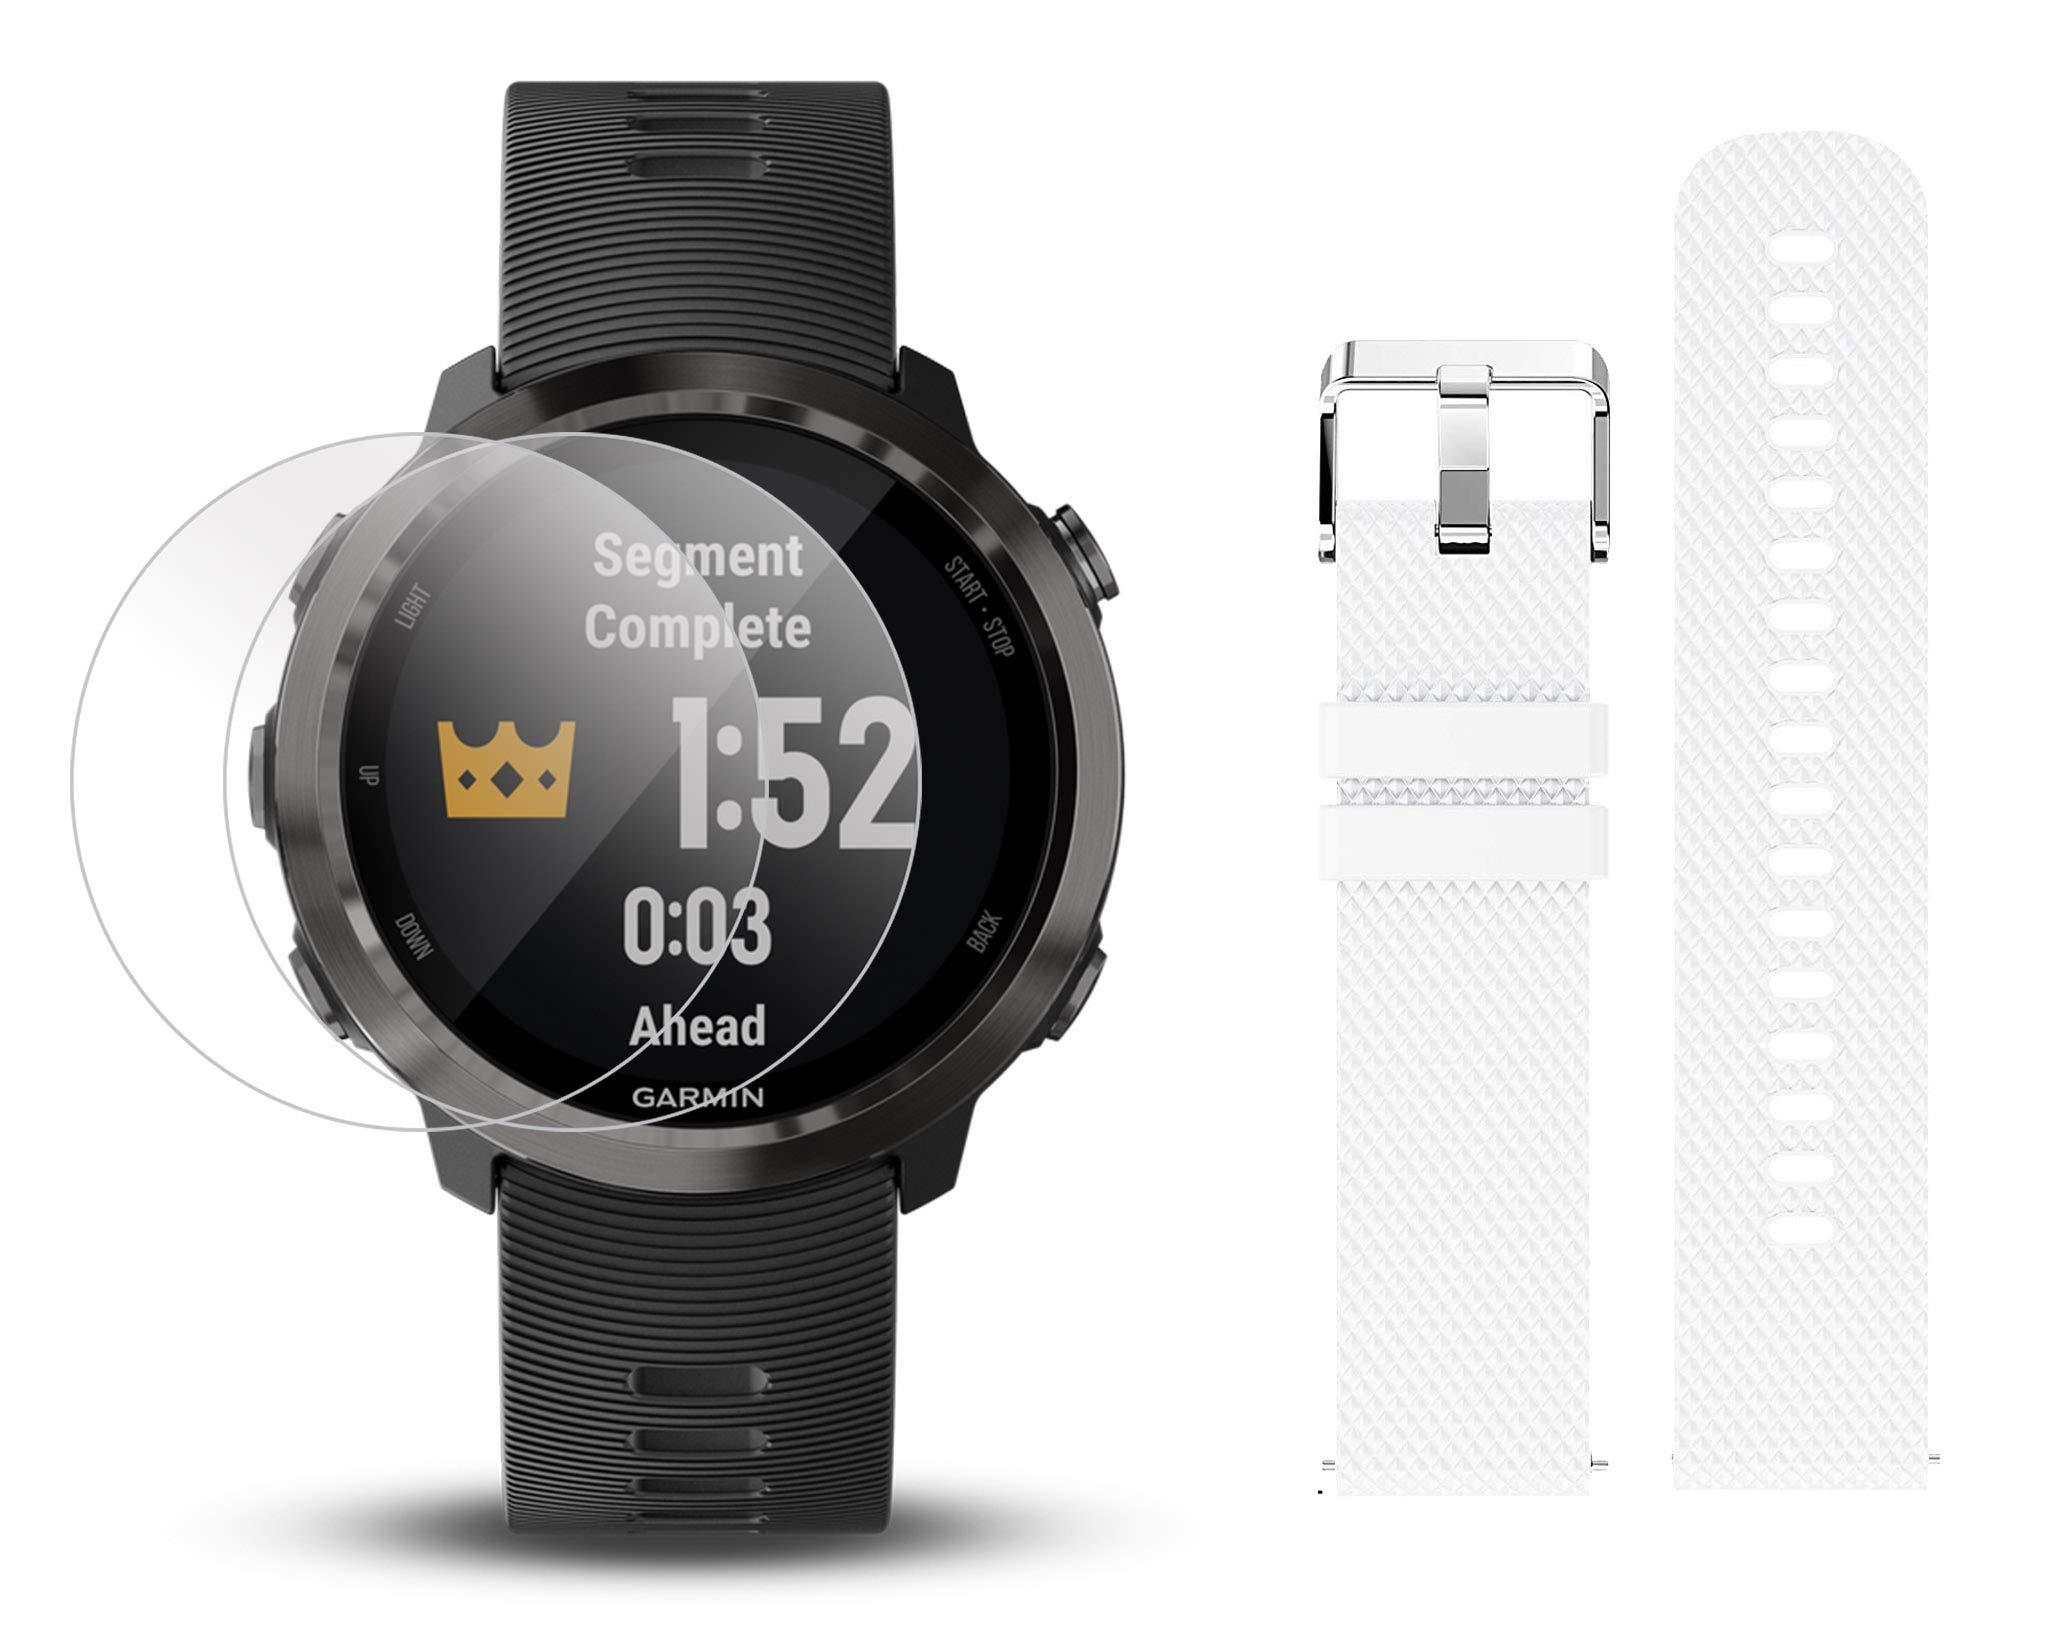 Garmin Forerunner 645 Music Bundle with Extra Band & HD Screen Protector Film (x4) | Running GPS Watch, Wrist HR, Music & Spotify, Garmin Pay (Slate + Music, White)